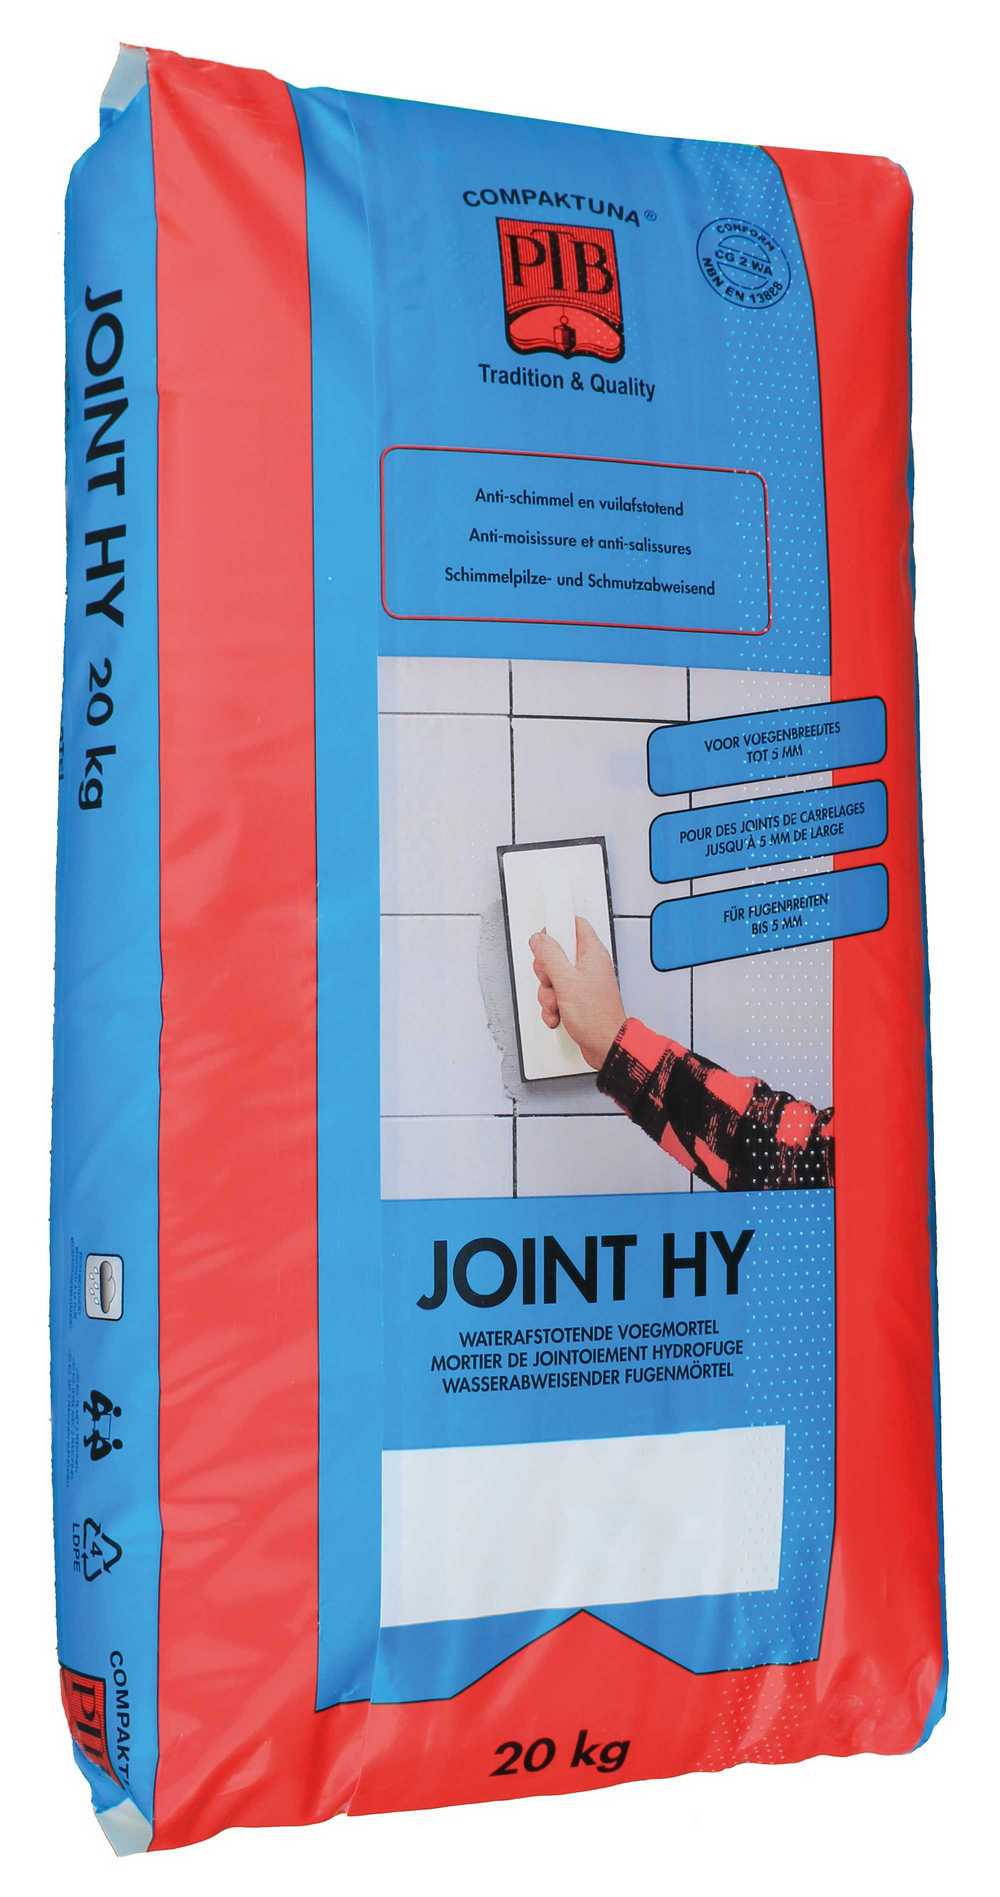 P.t.b.-joint Hy 20kg Jasmijn